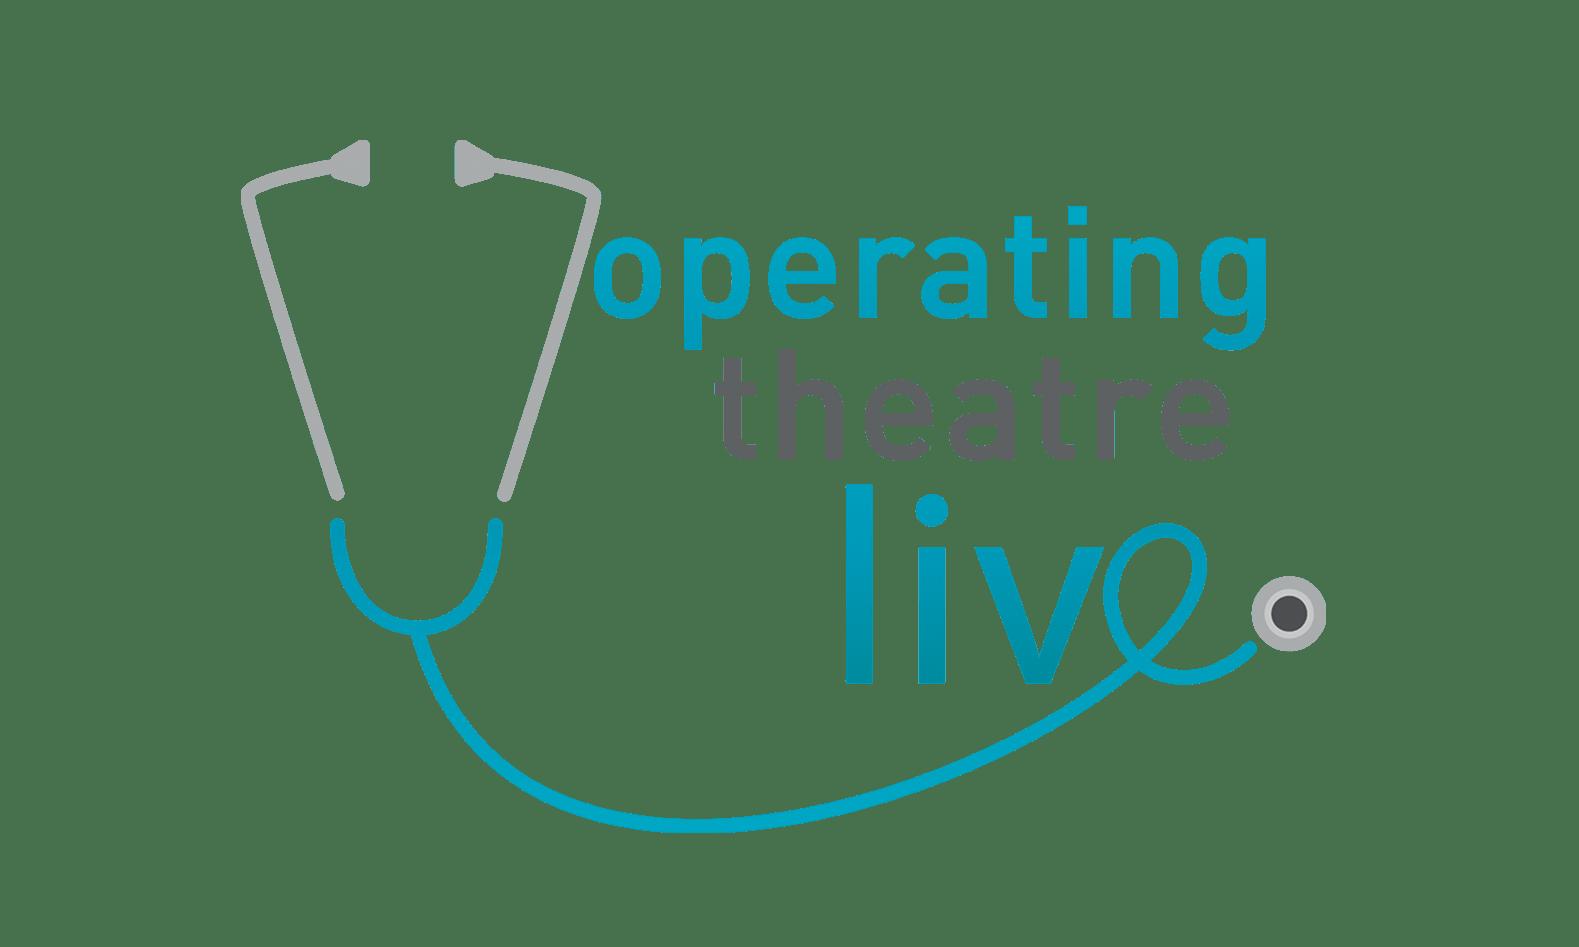 OPERATING THEATRE LIVE National Tour | CORNWA